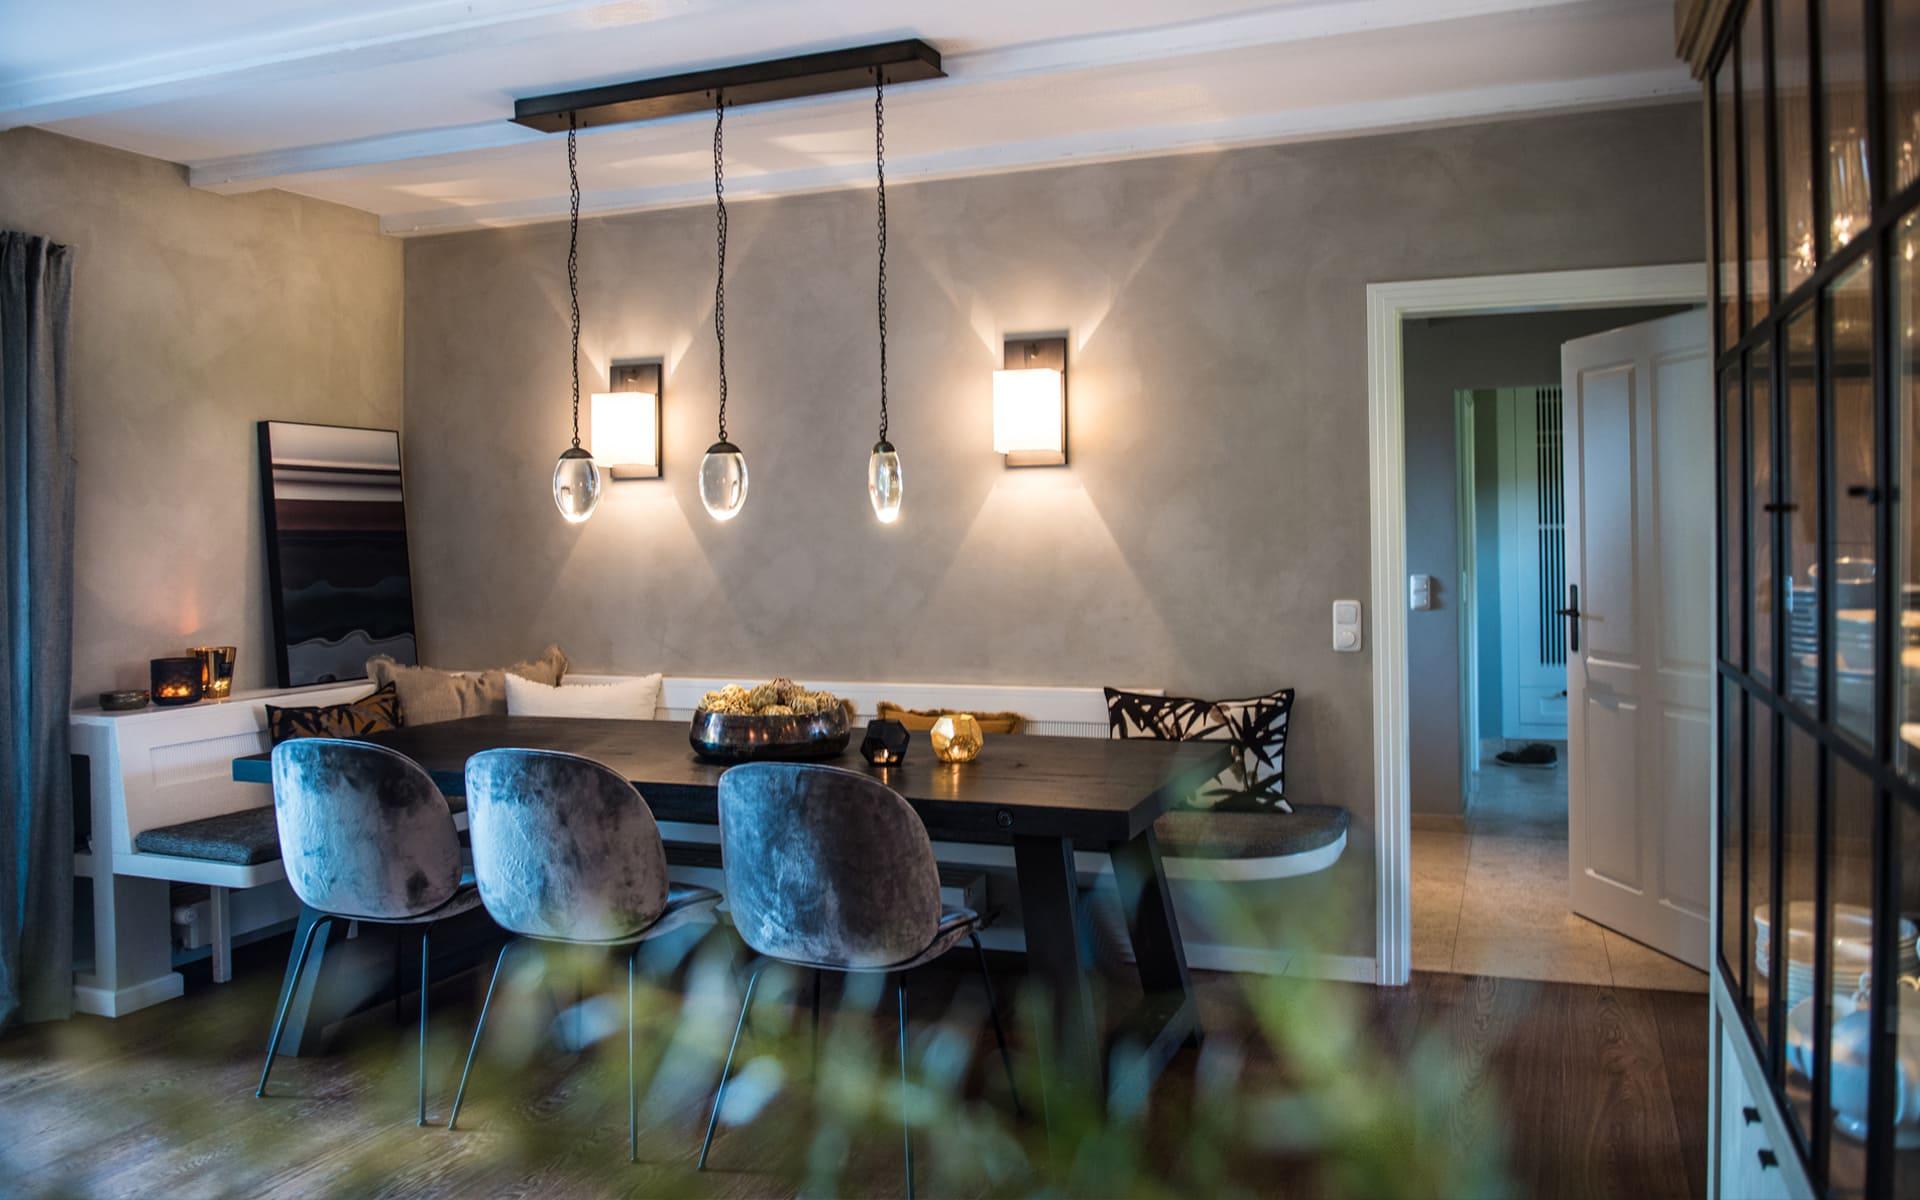 katharina-kamm-raumkultur-gmund-tegernsee-interior-design-privathaus-bad-toelz-esszimmer-ochre-celestial-pebble-chandelier-linear-gubi-beetle-chair-eckbank-stoff-kissen-de-le-couna